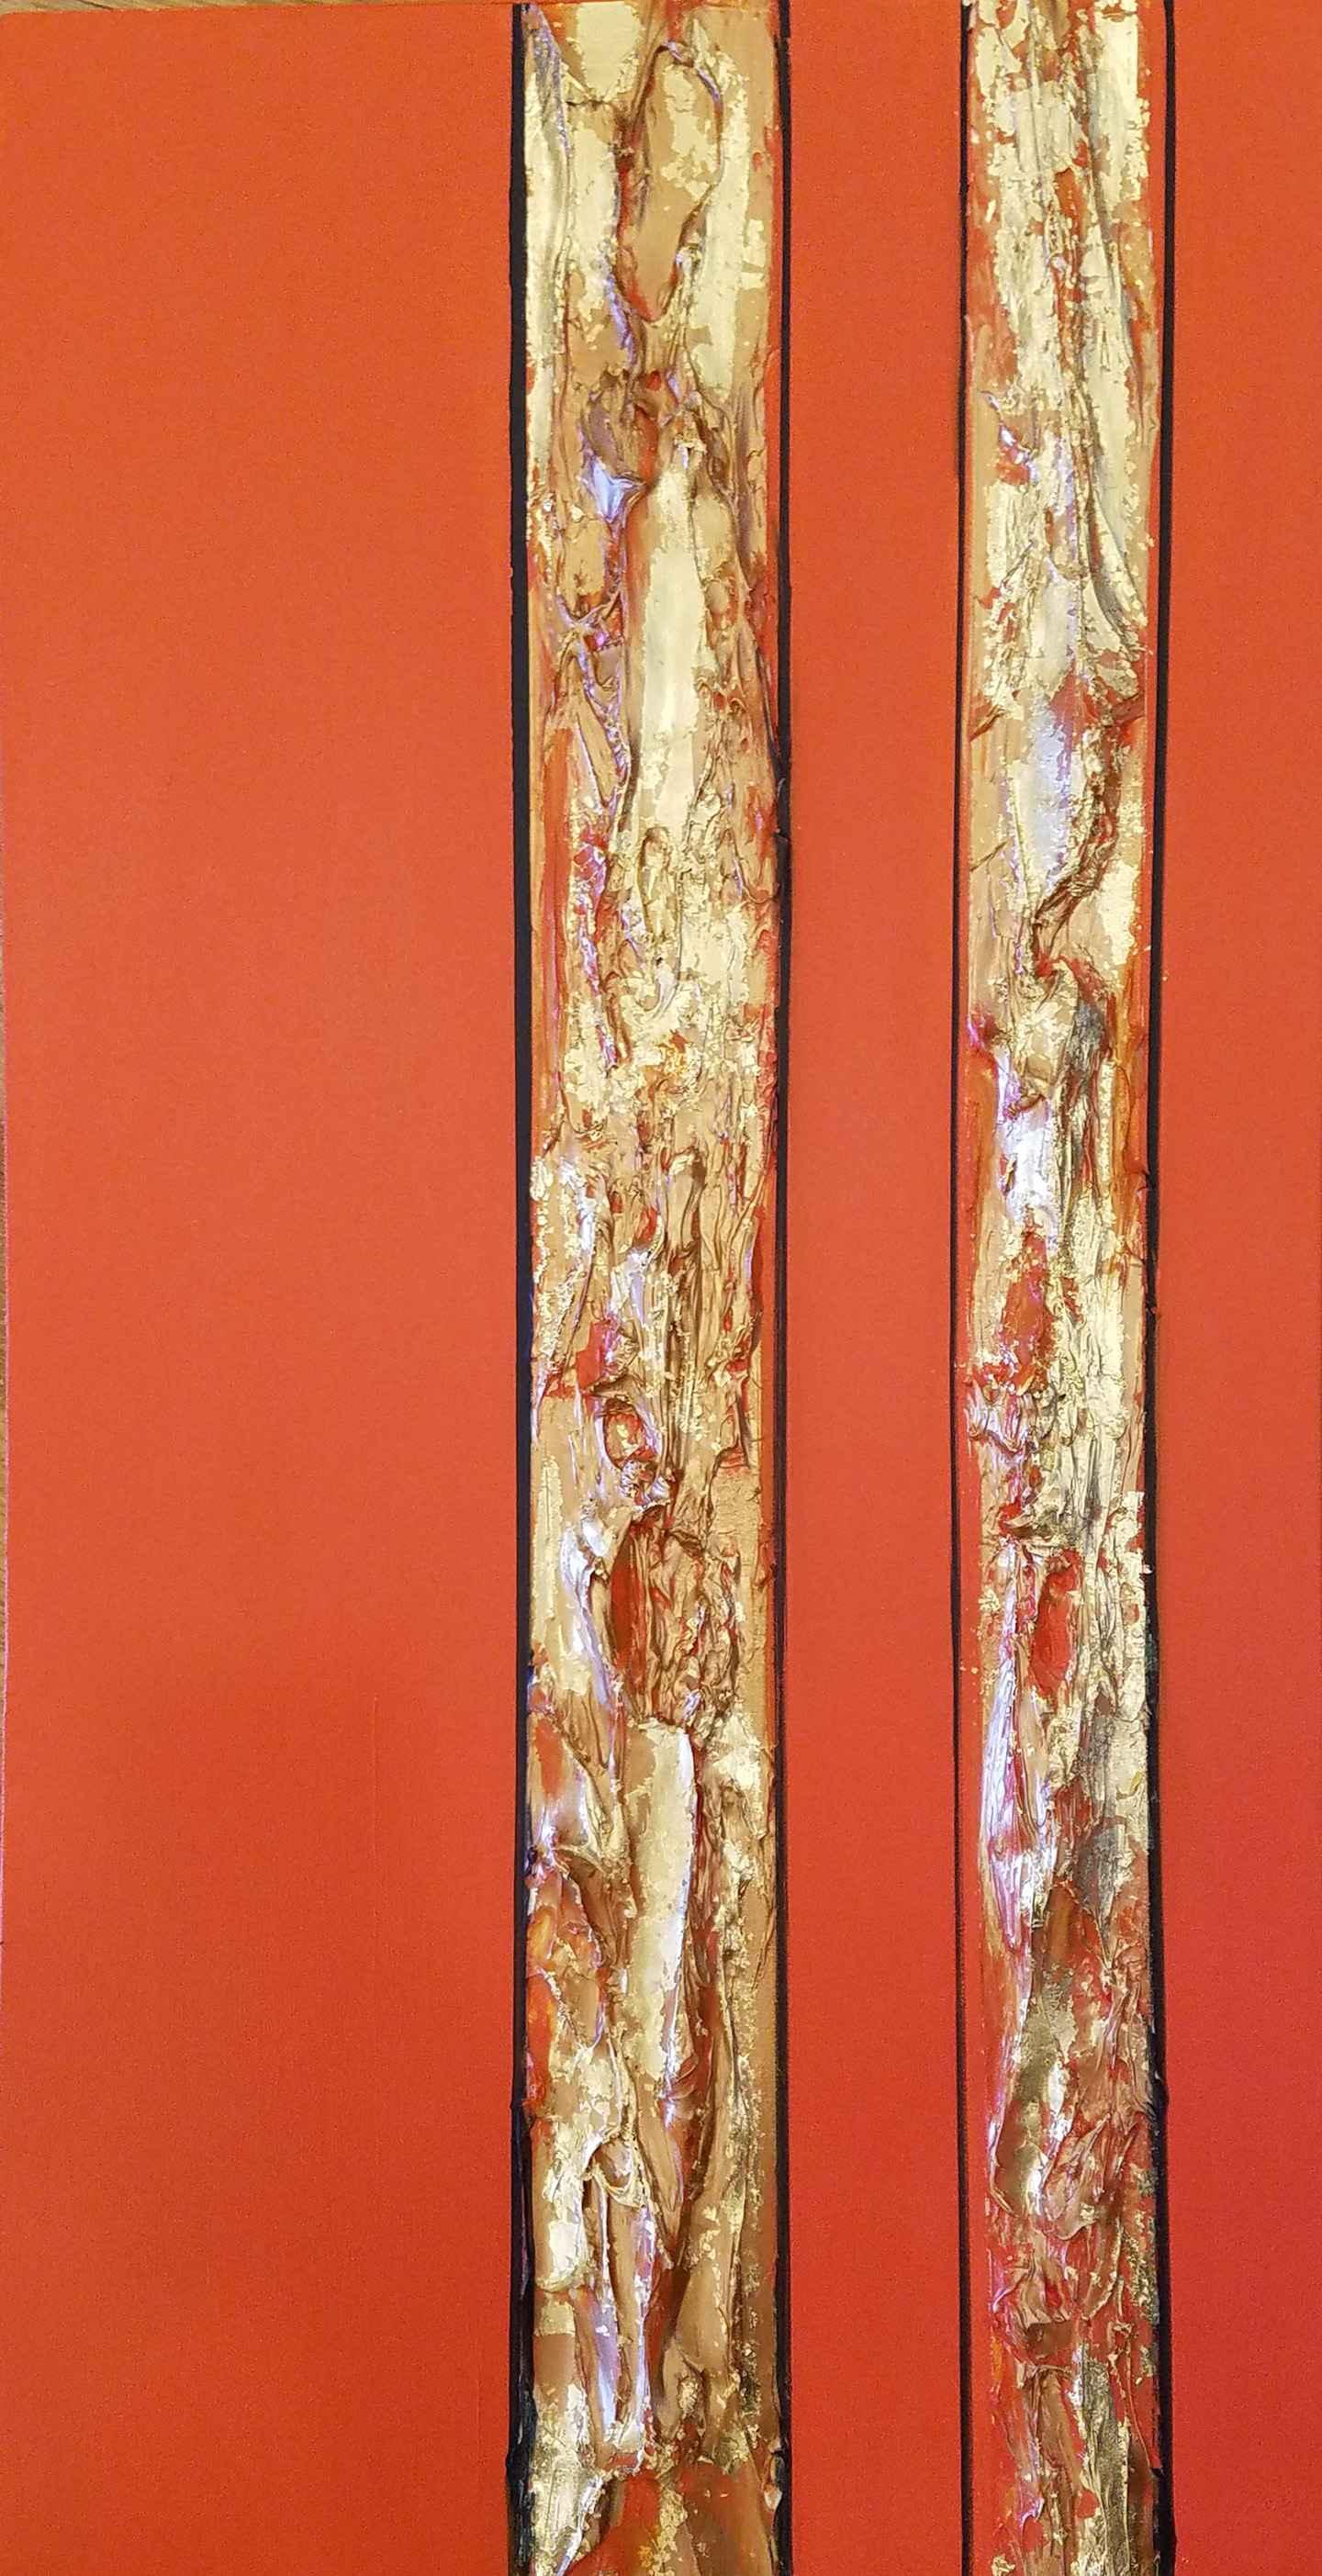 The Orange One by  Steve Lyons - Masterpiece Online